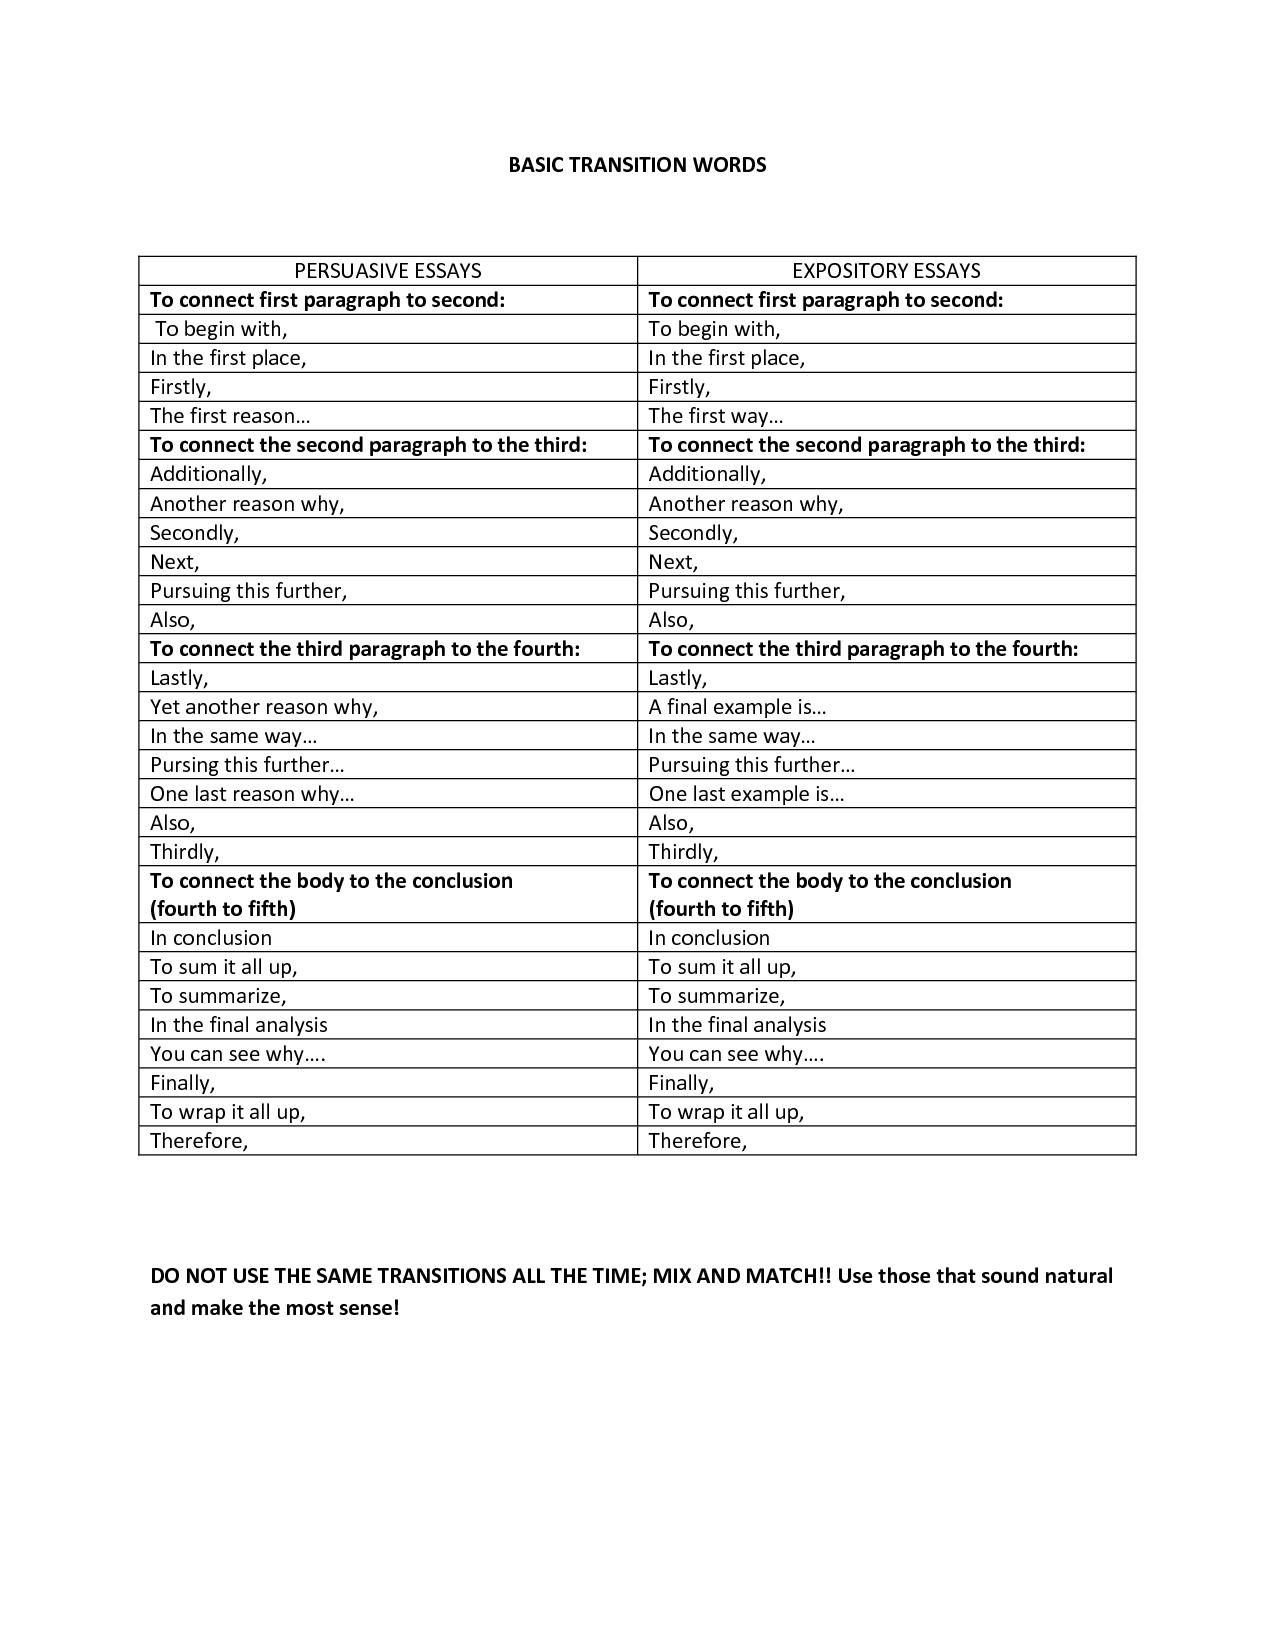 Flashback Worksheet Transitions